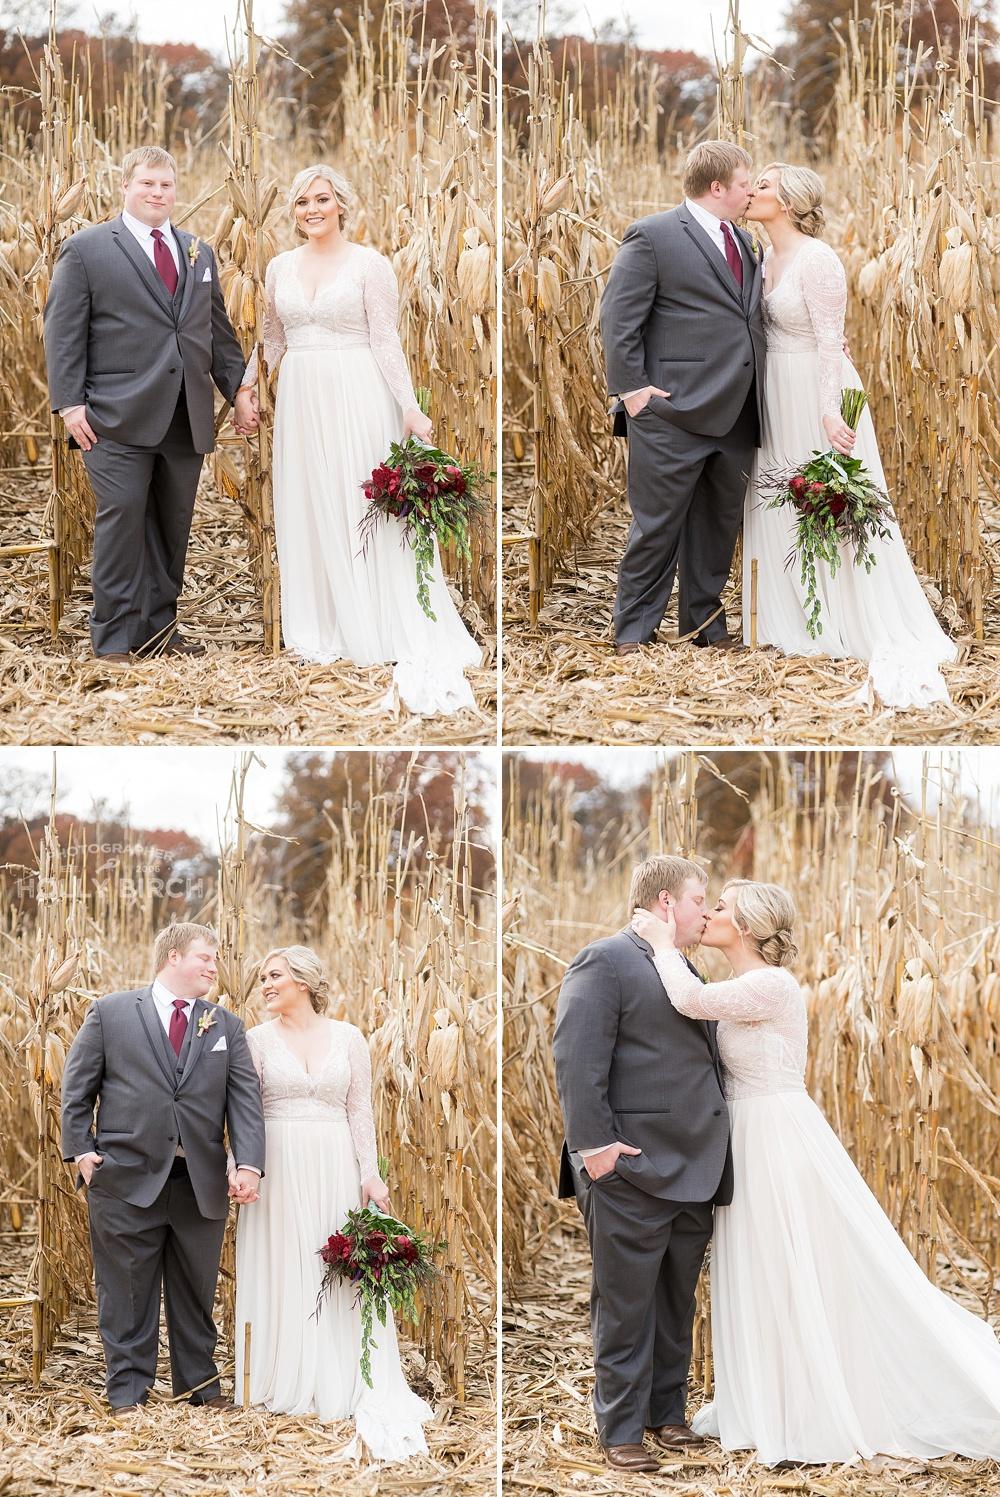 Taylorville-PIllars-Event-Center-fall-farm-wedding-with-corn_4161.jpg